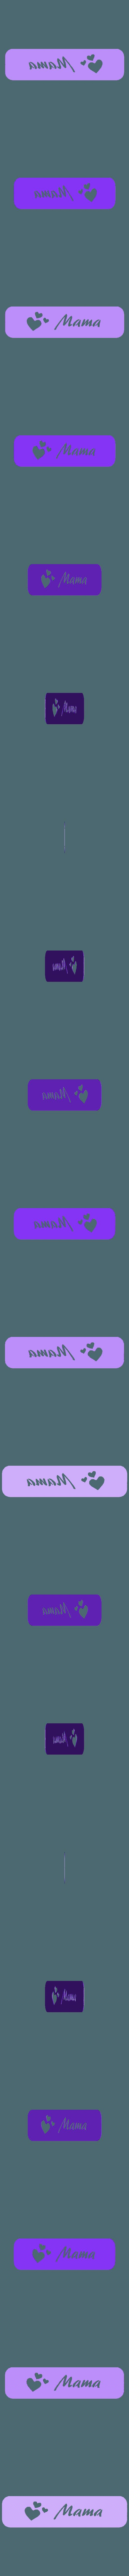 JG_bookmark_mama_v2.stl Download free STL file Bookmark - Hearts - Mama / Mom • 3D printable model, c47